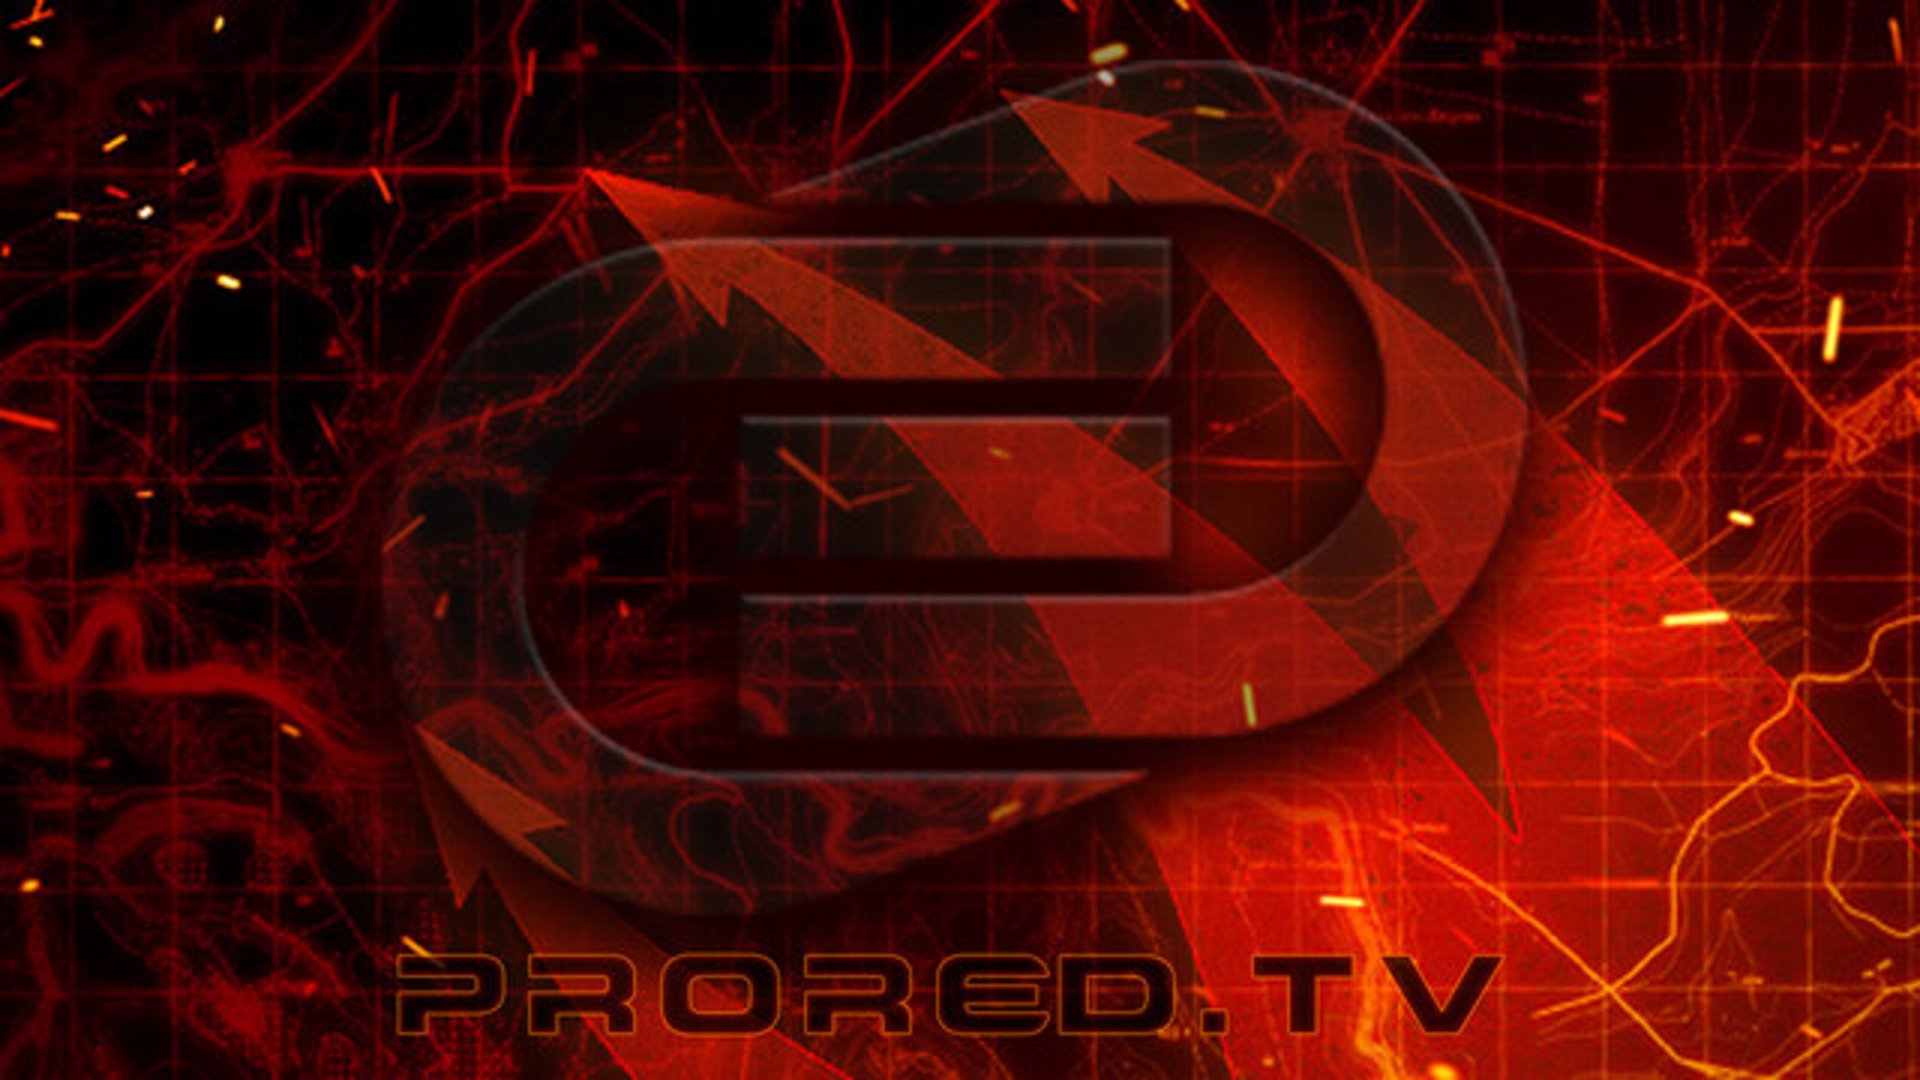 proredtv3